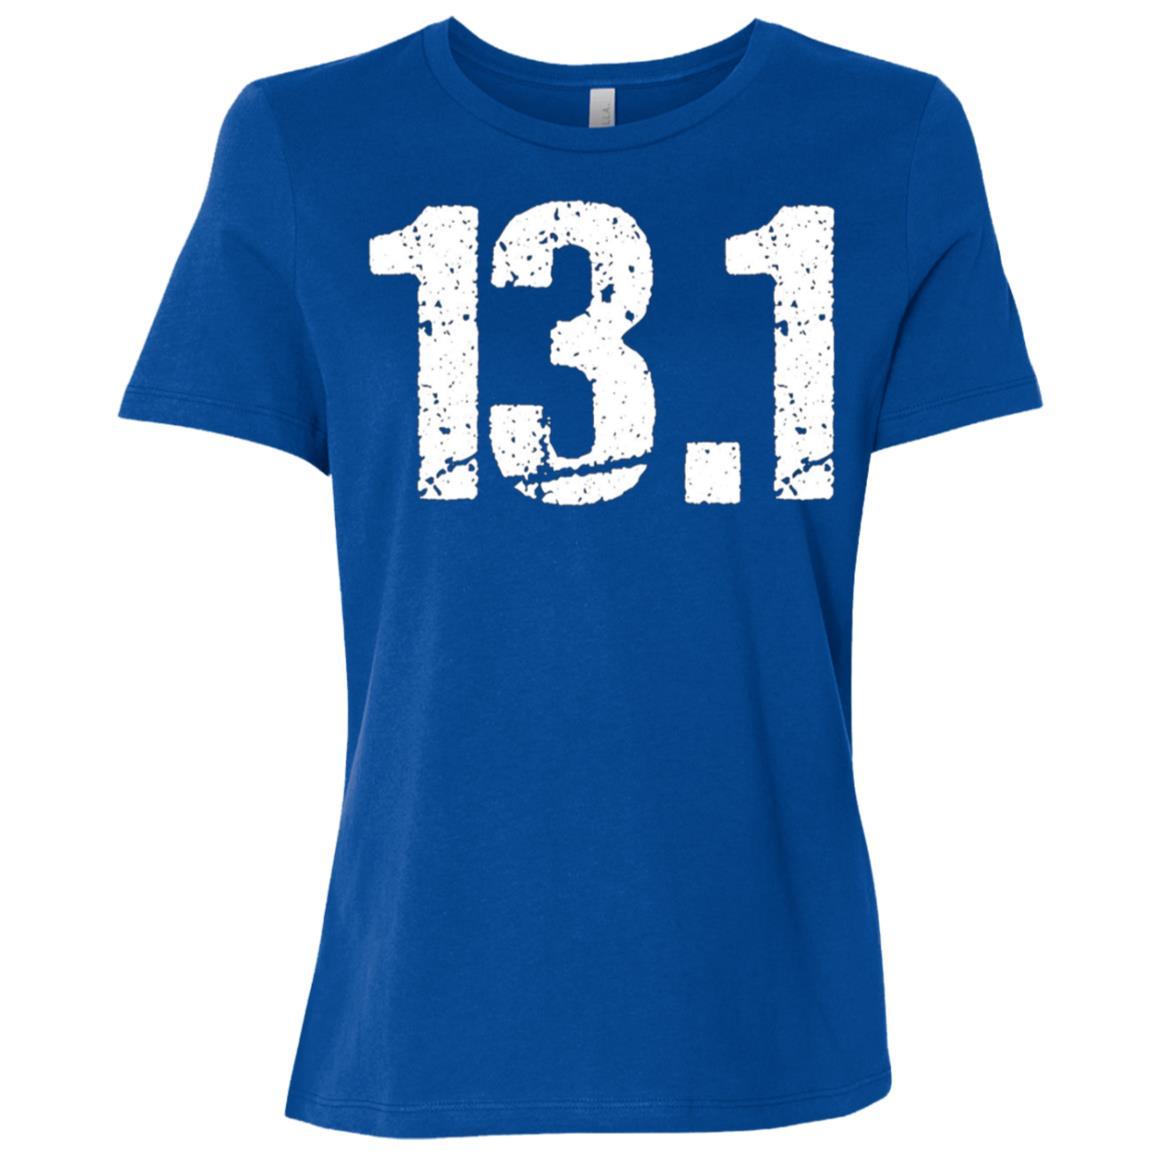 13.1 for Half Marathon Runners Grunge Distressed Women Short Sleeve T-Shirt